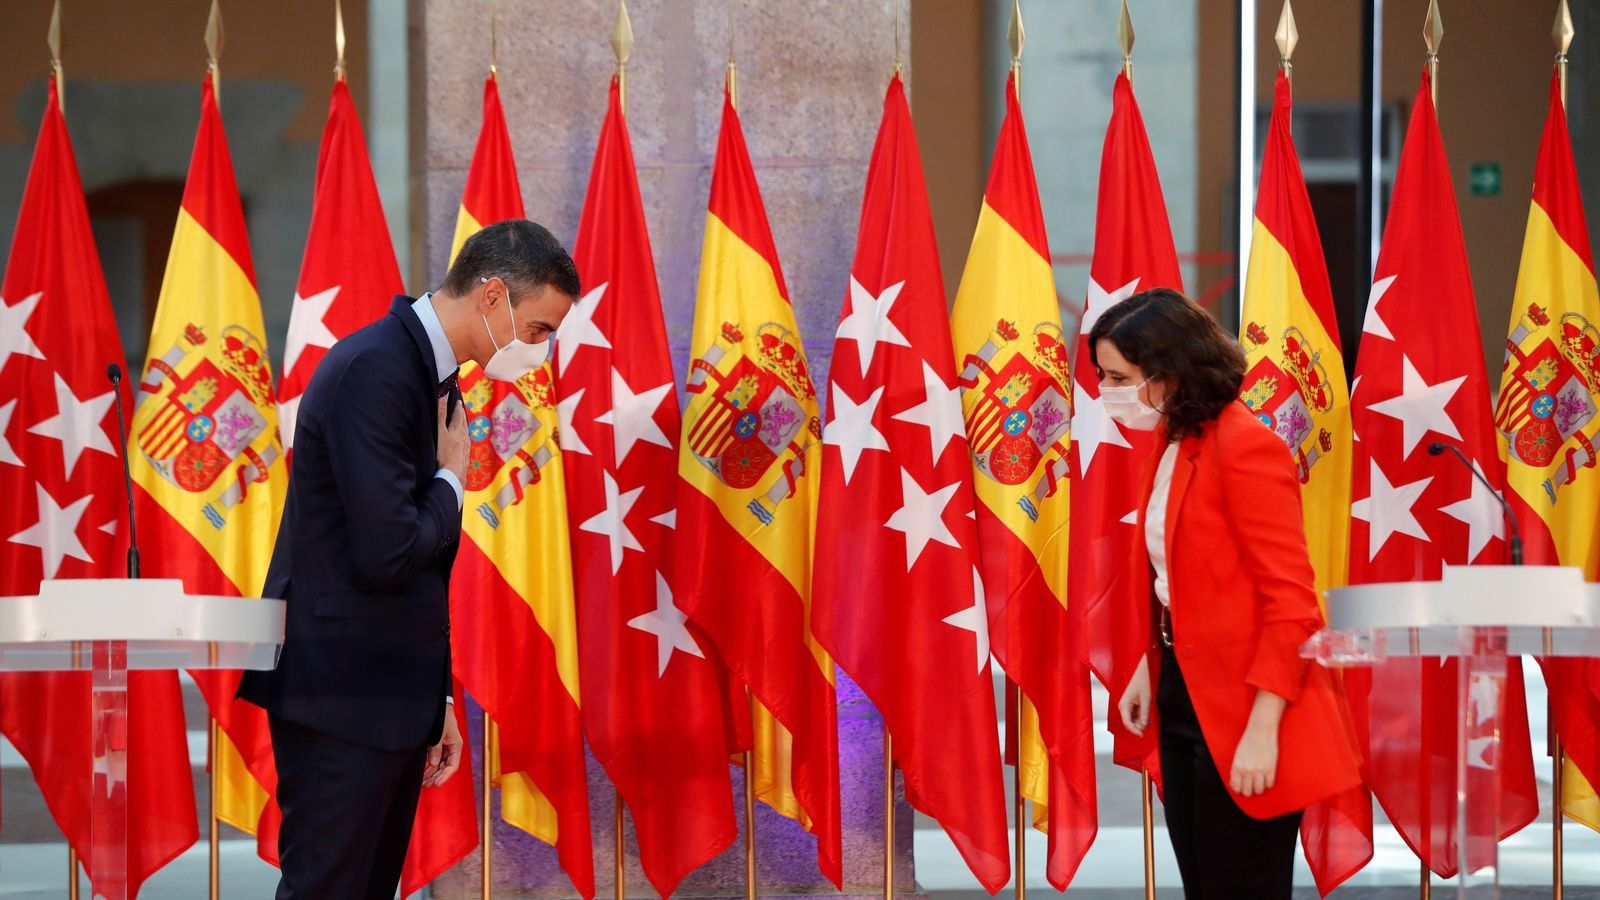 24 banderes espanyoles i de la Comunitat de Madrid han presidit la roda de premsa del president espanyol, Pedro Sánchez, i la presidenta madrilenya, Isabel Díaz Ayuso, a la seu del govern regional.